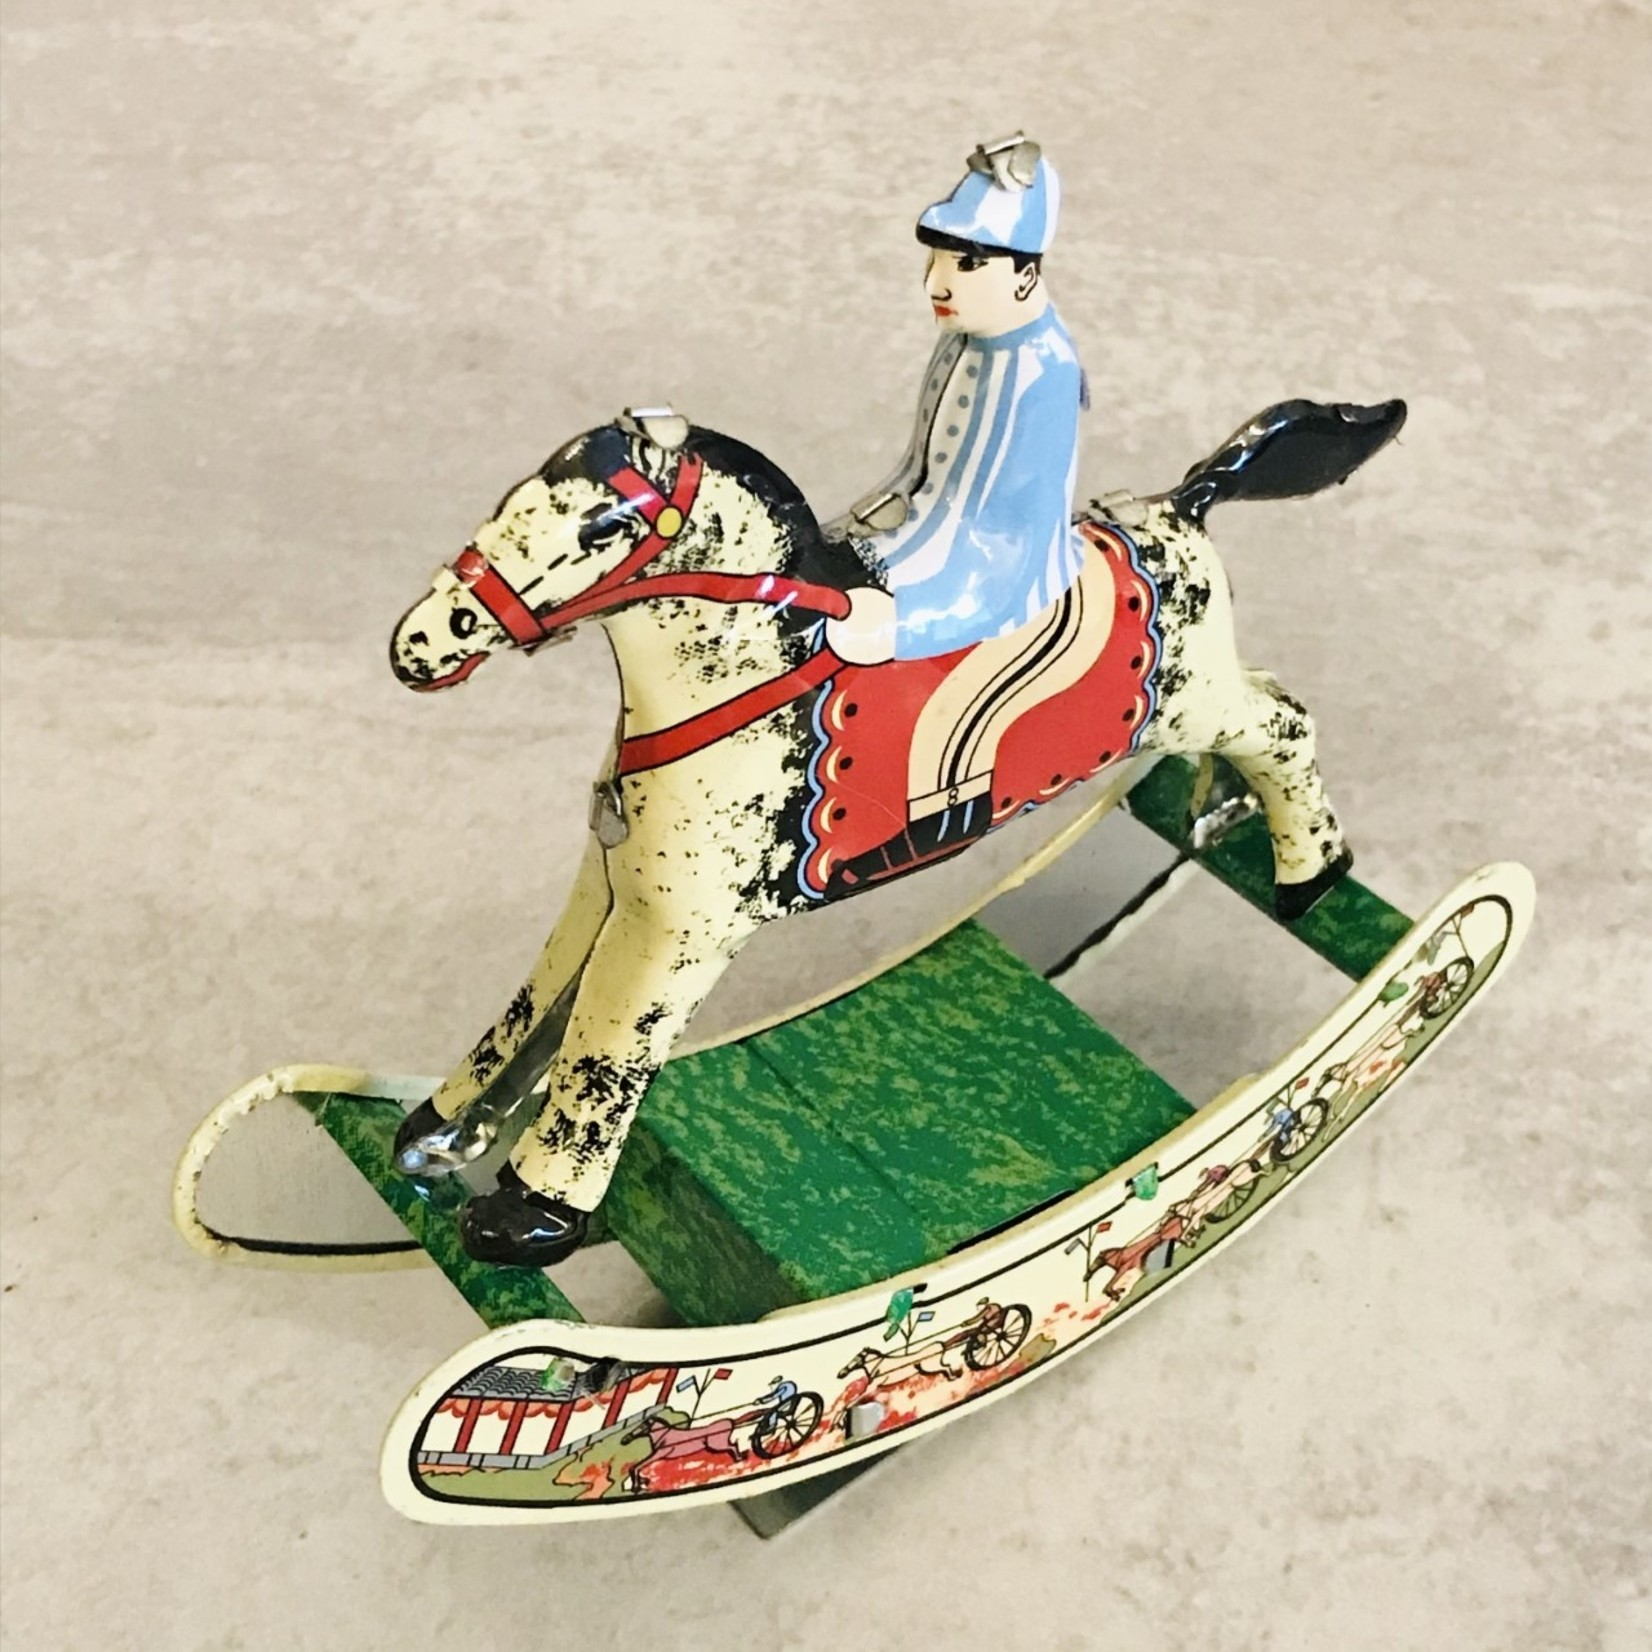 Blechfabrik Blechfabrik Rider on Rocking Horse